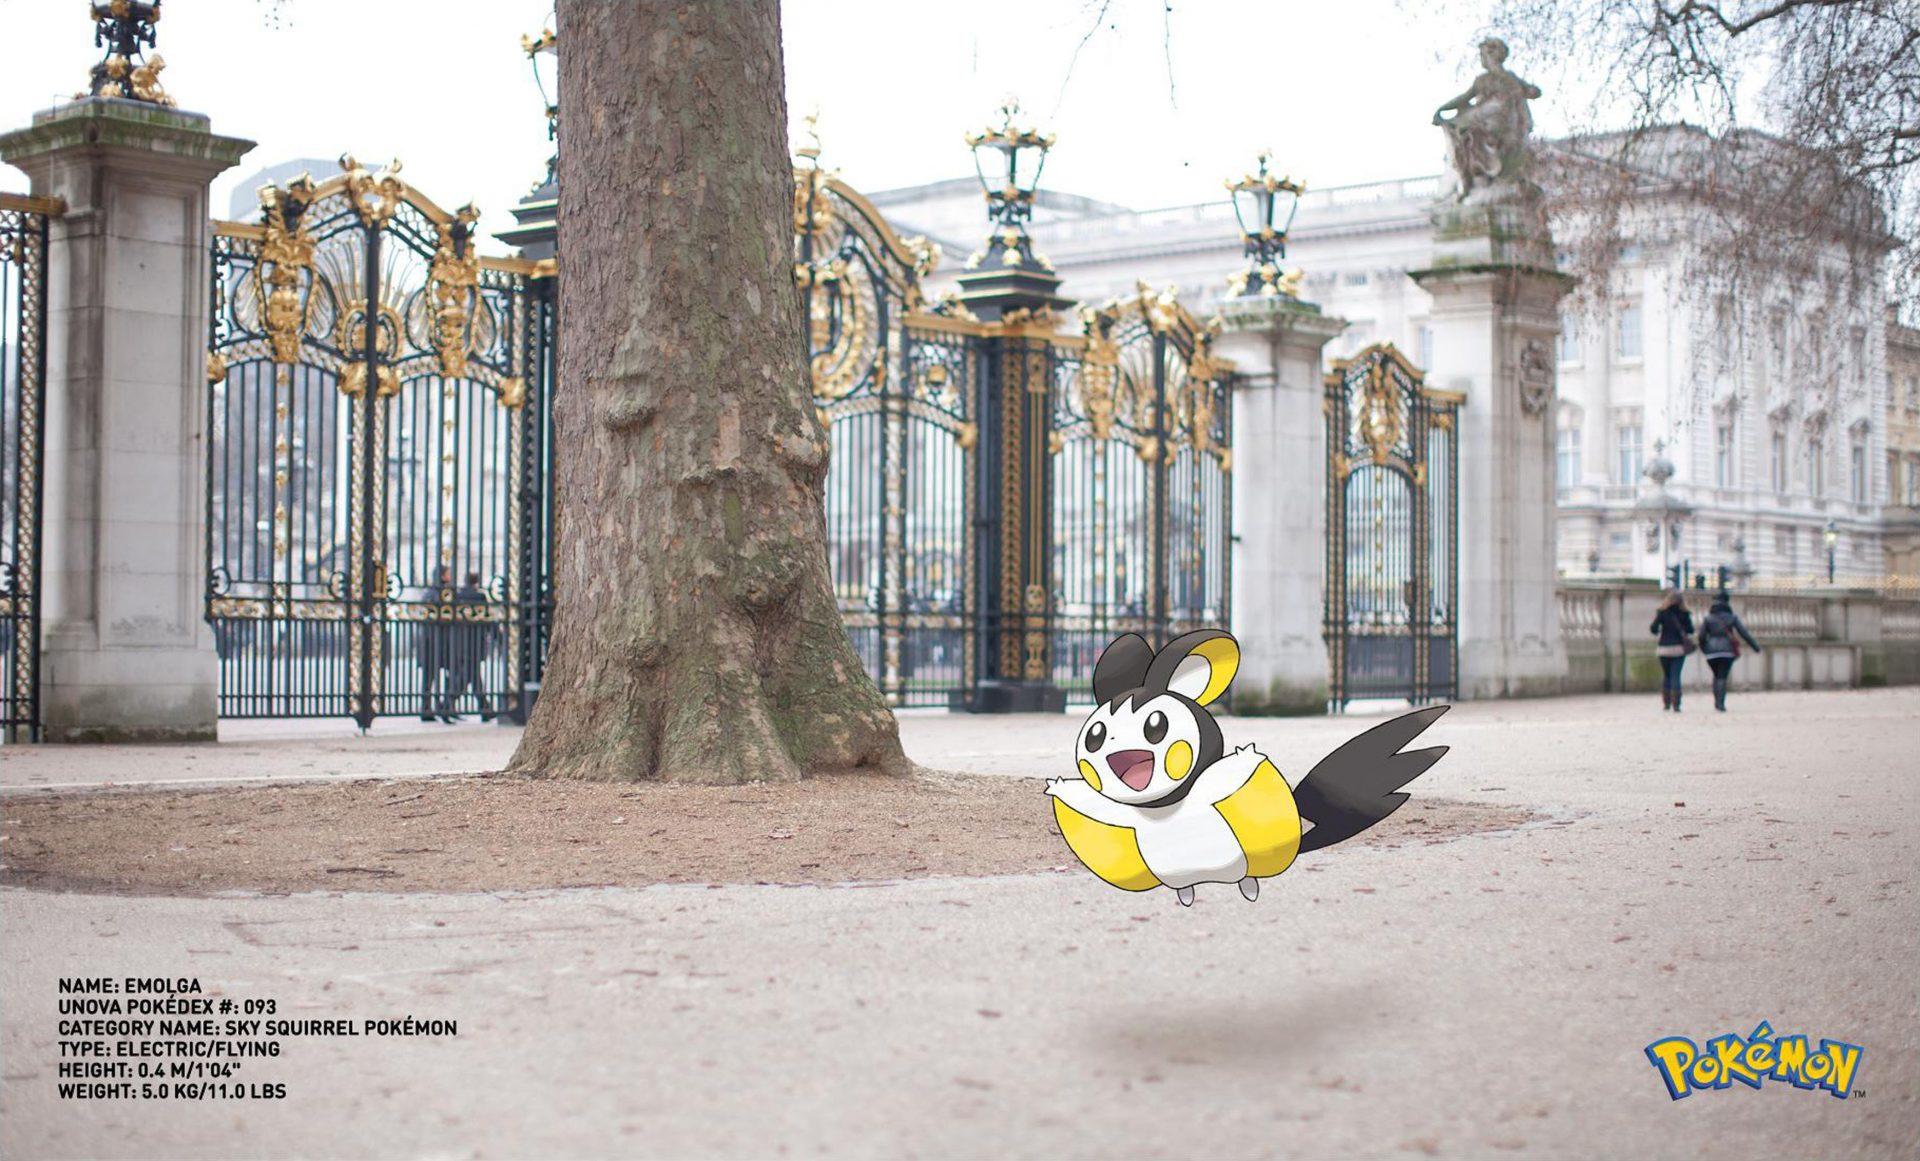 Pokemon Go Emolga sky squirrel Dentsu London Buckingham Palace the Queen's house – Shaw and Shaw advertising photography photographer photographers